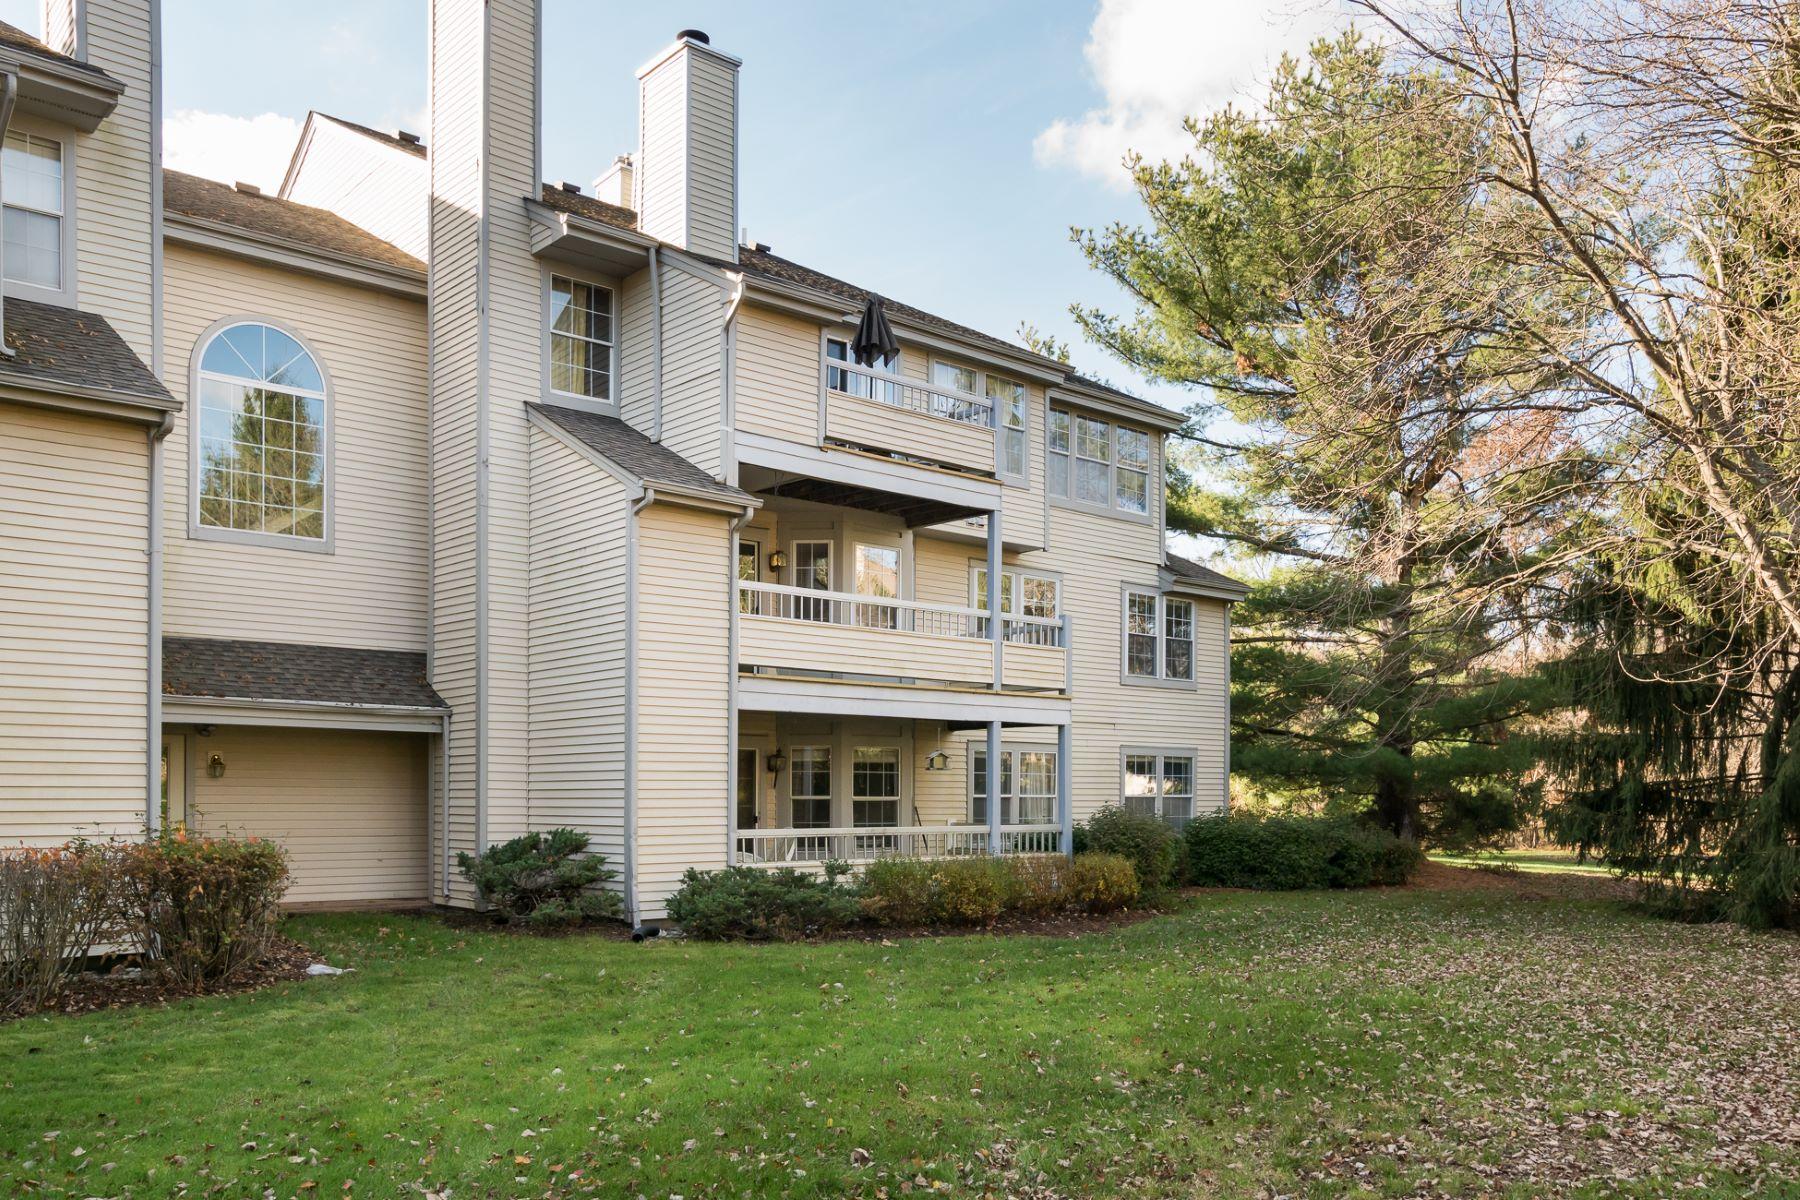 Condominiums 용 매매 에 Enjoy Lovely Views in Convenient Canal Pointe 302 Trinity Court #6, Princeton, 뉴저지 08540 미국